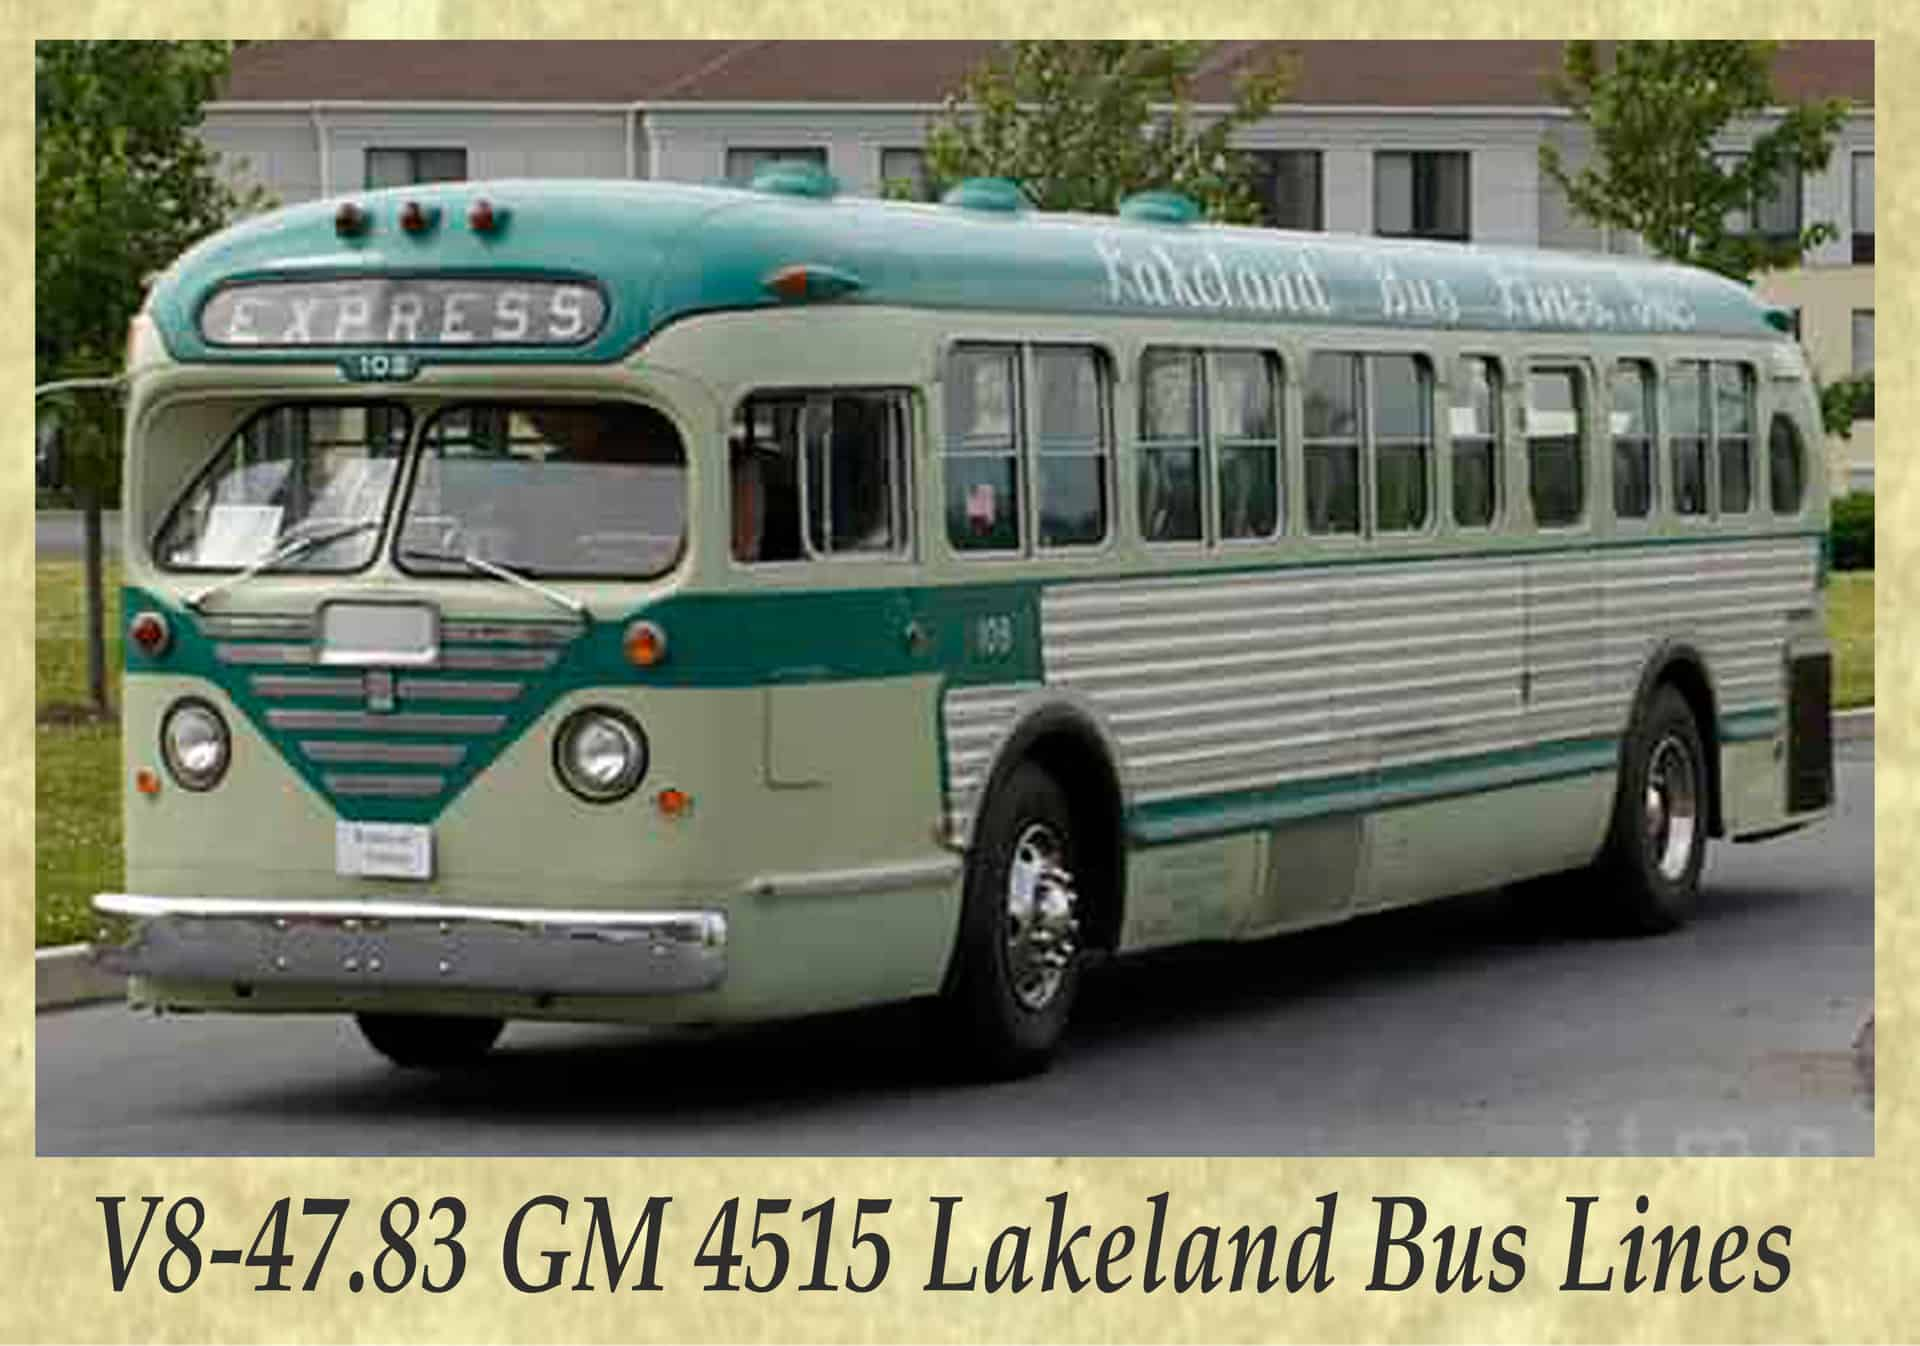 V8-47.83 GM 4515 Lakeland Bus Lines